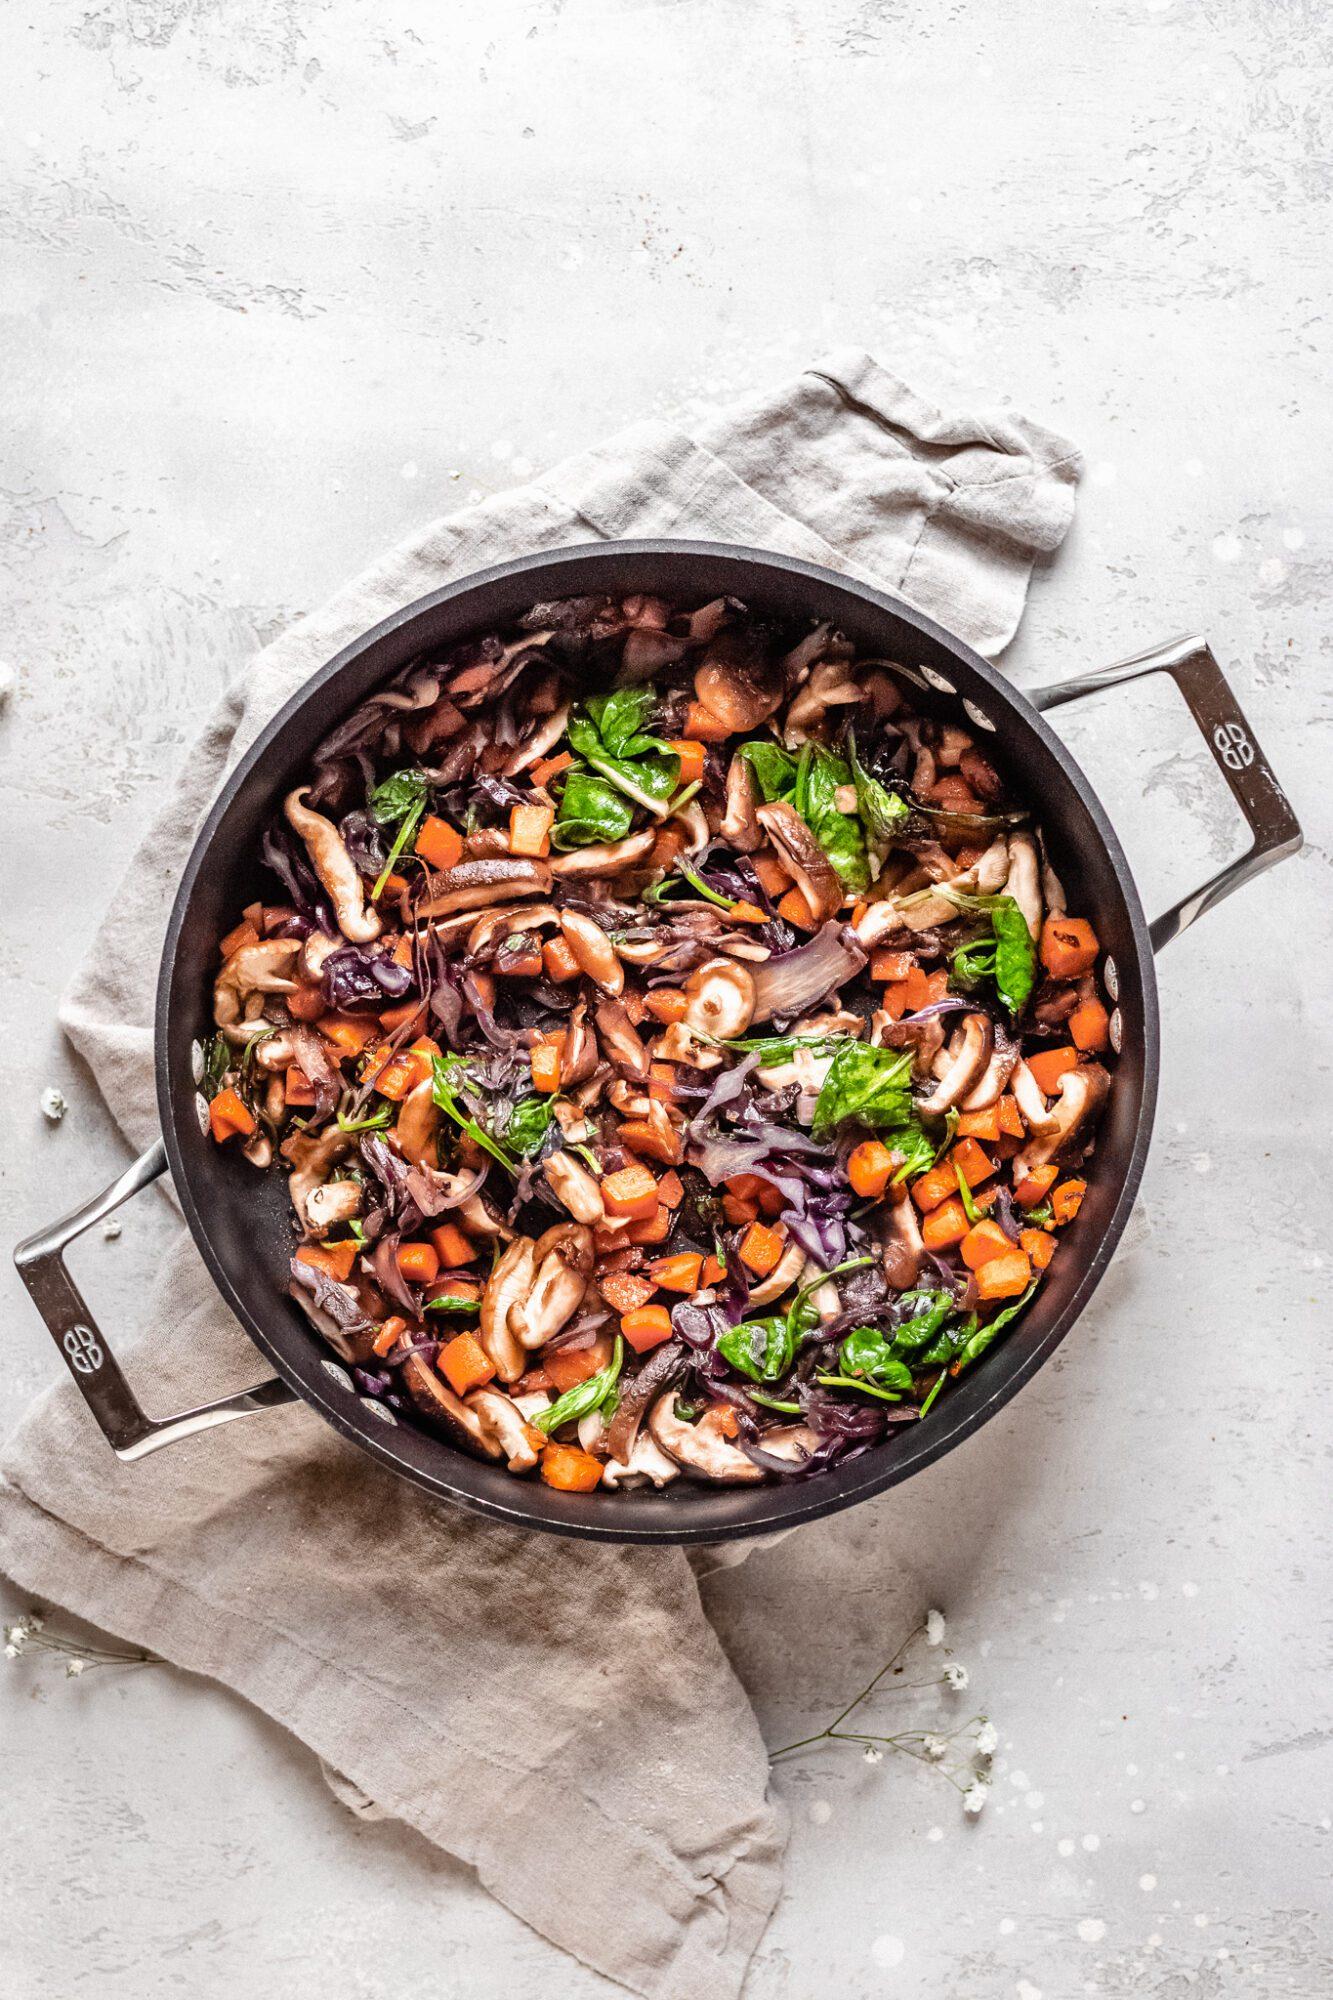 skillet of stir fry veggies